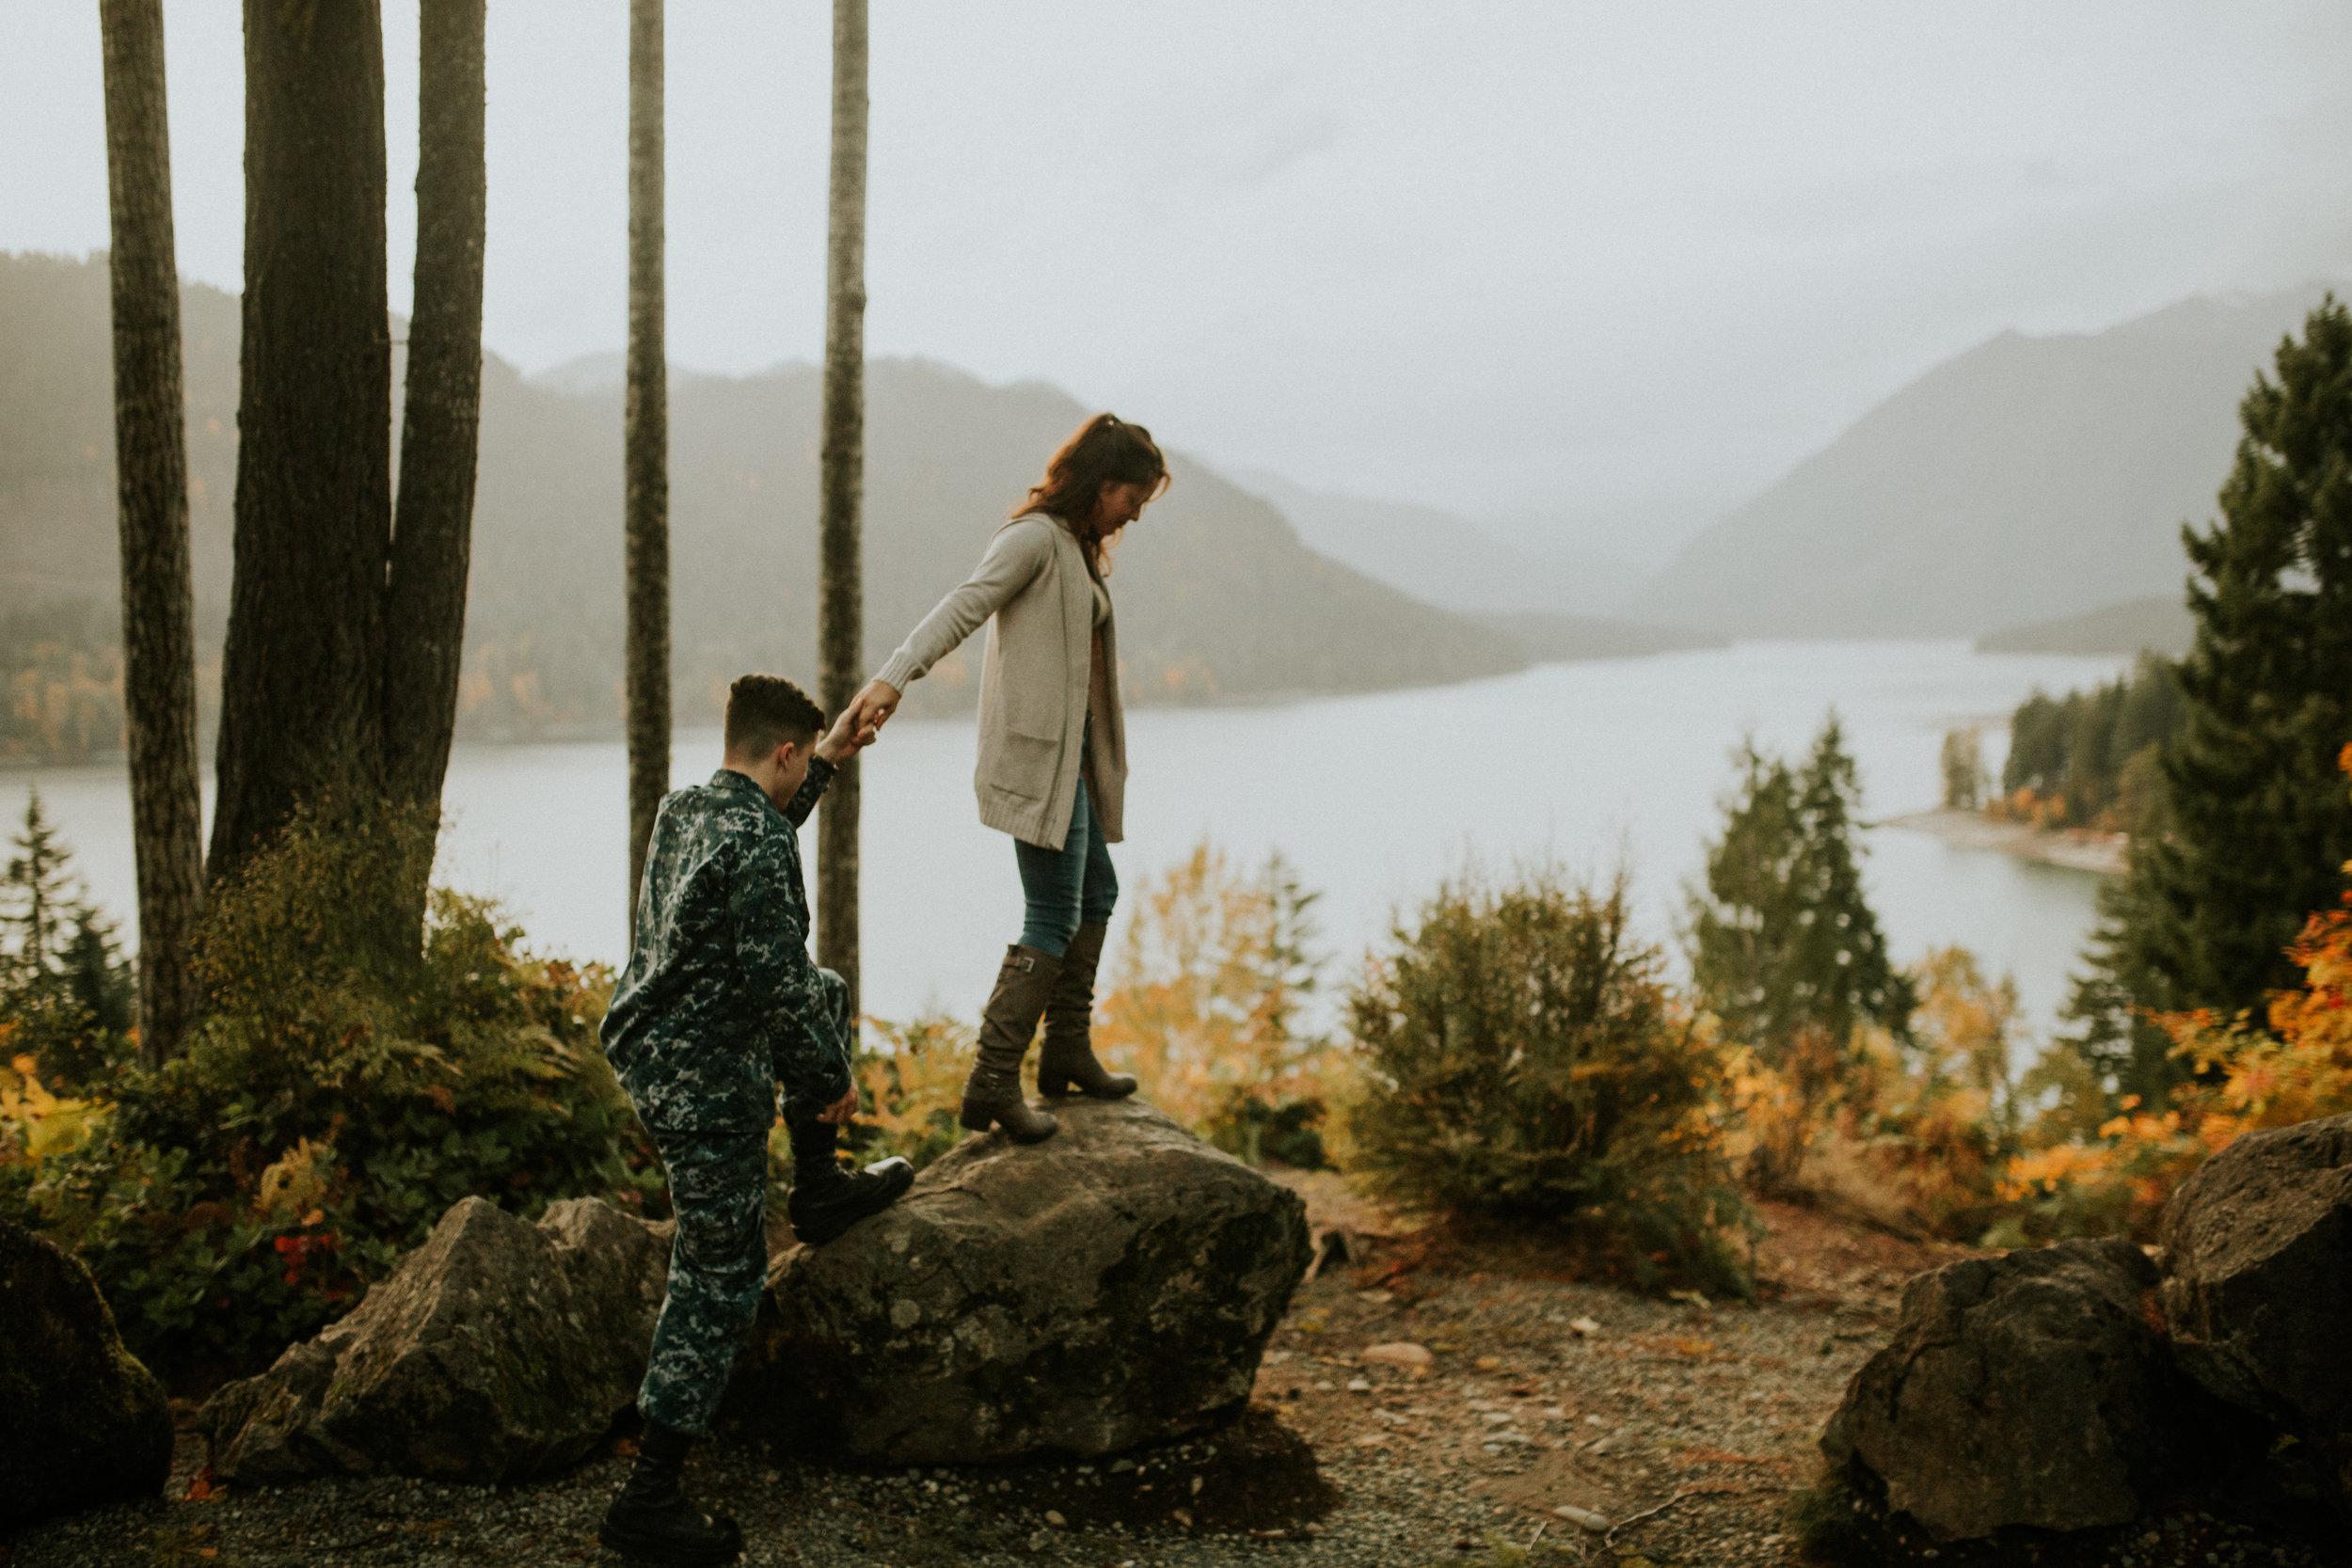 Lake-Cushman-Adventure-Engagement-photographer-breeanna-lasher-83.jpg